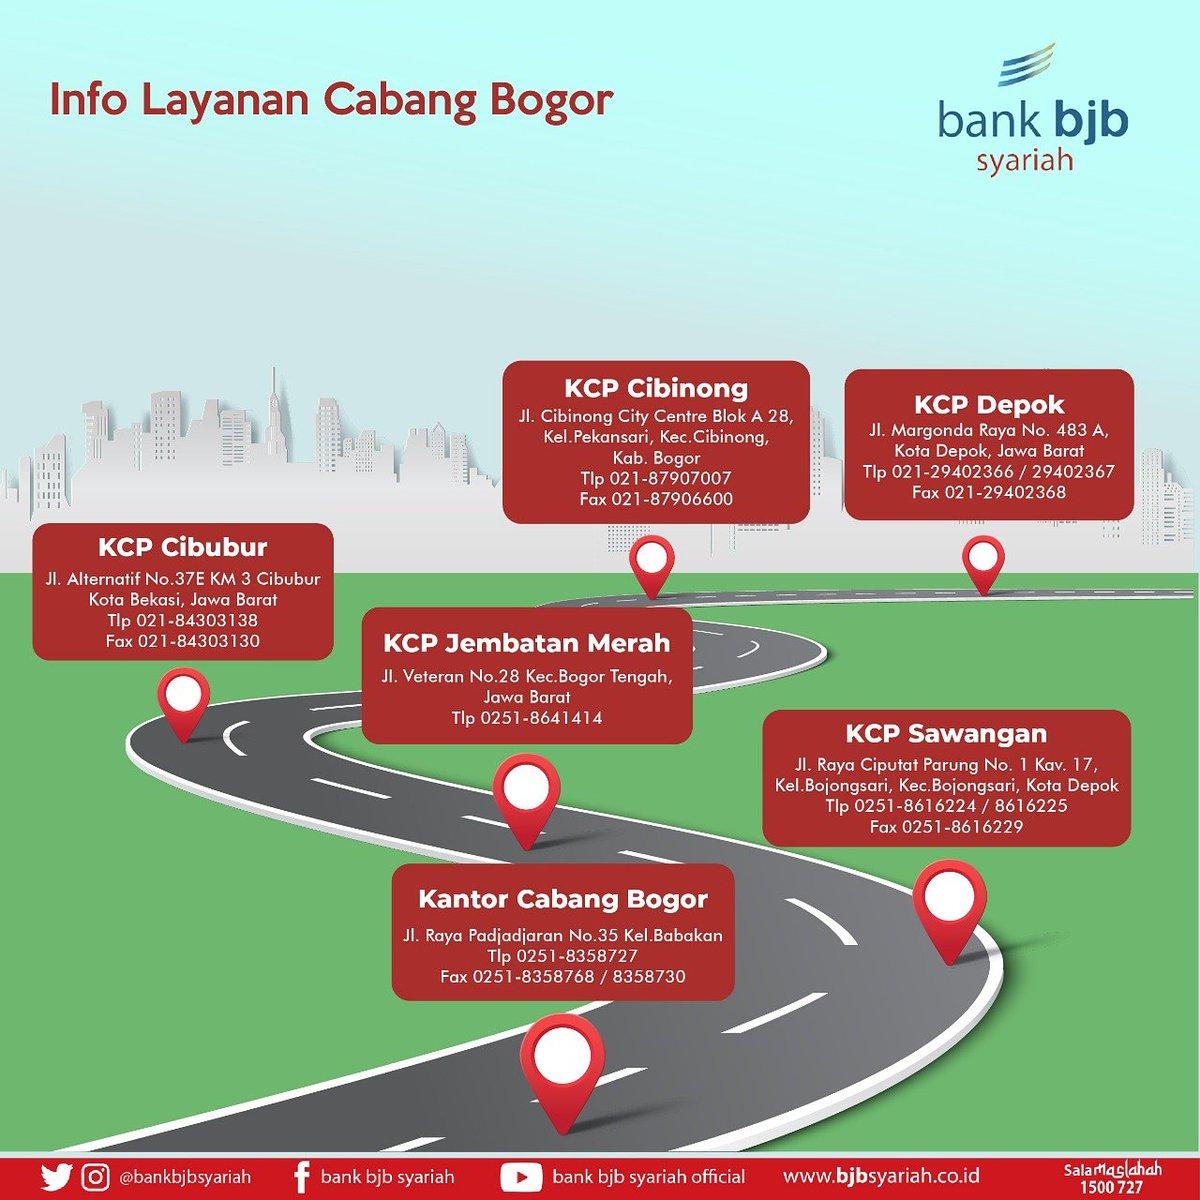 Bank Bjb Syariah Bekasi Jawa Barat - Seputar Bank